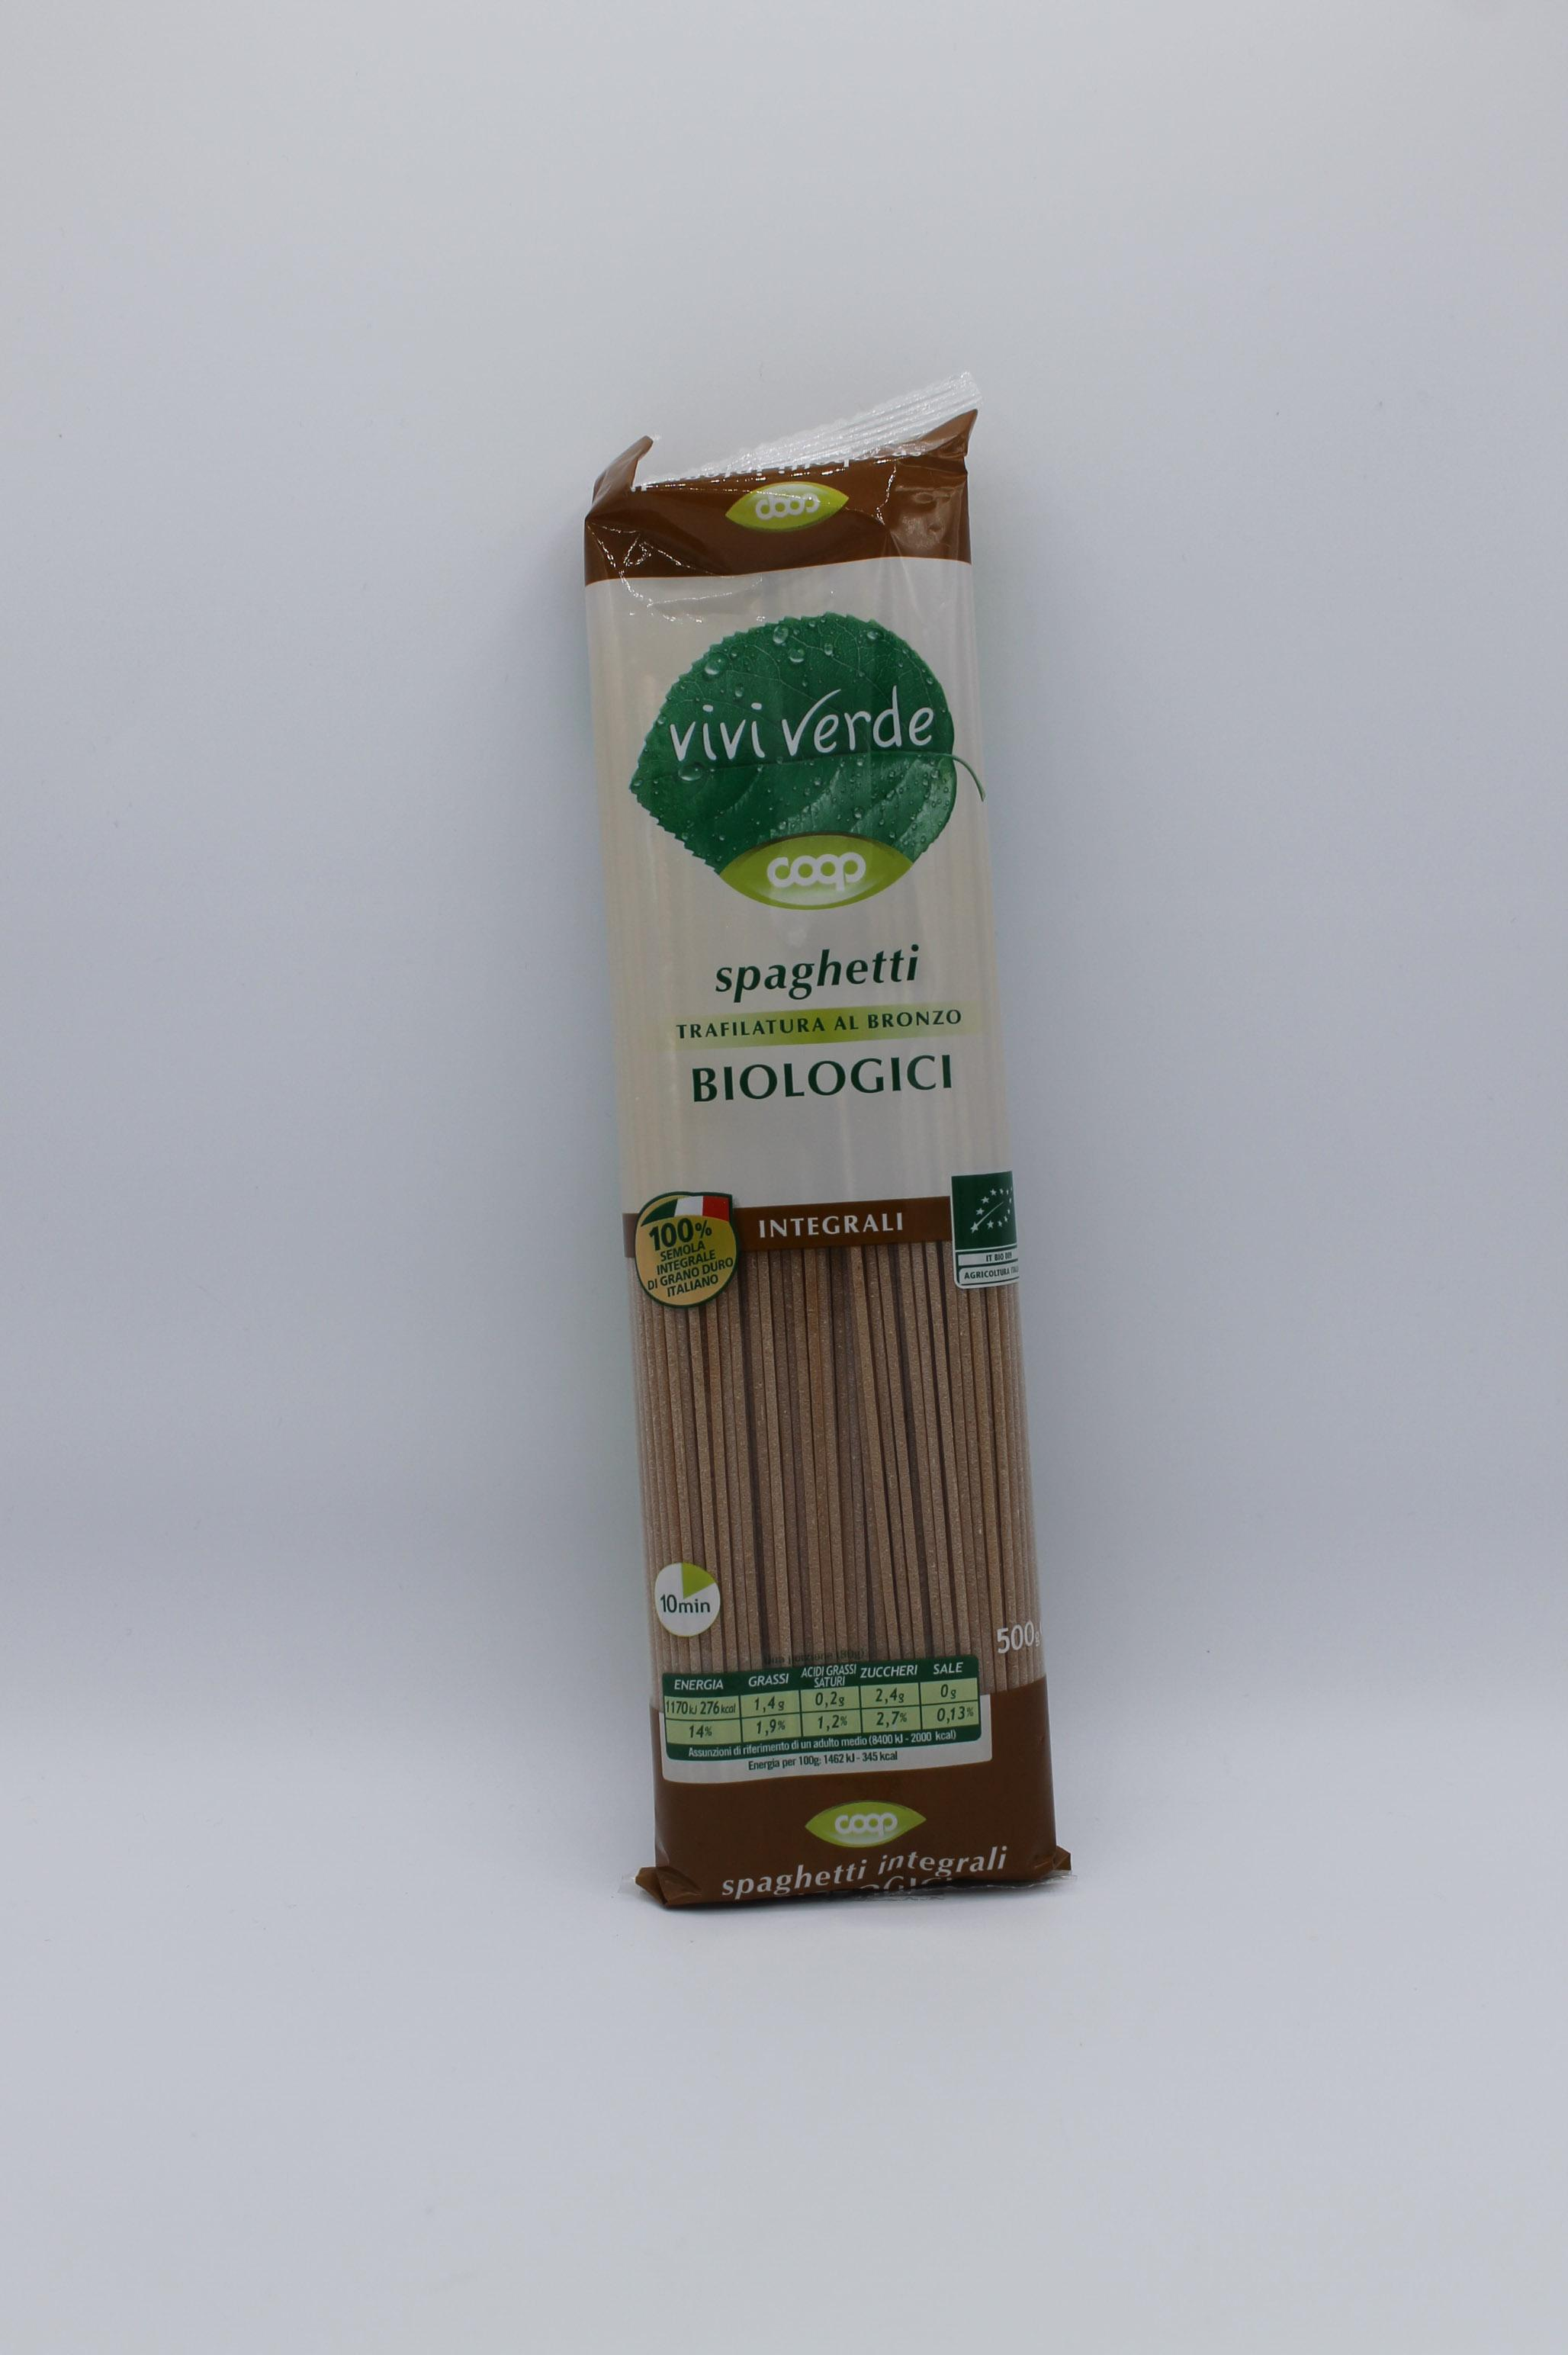 Viviverde coop spaghetti integrali bio 500gr.